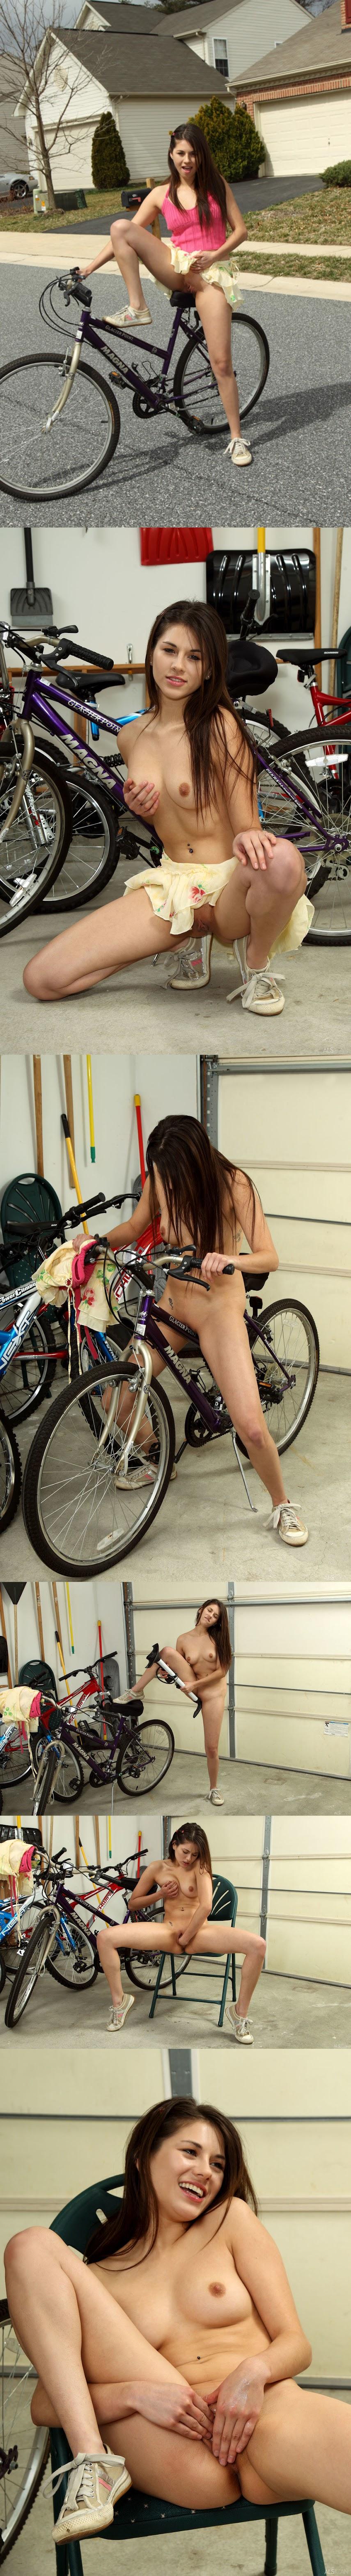 Debriz ALS 2014-03-09 PRO-CYCLIST-SHYLA-JENNINGS-by-ALS-PHOTOGRAPHER ee630 high